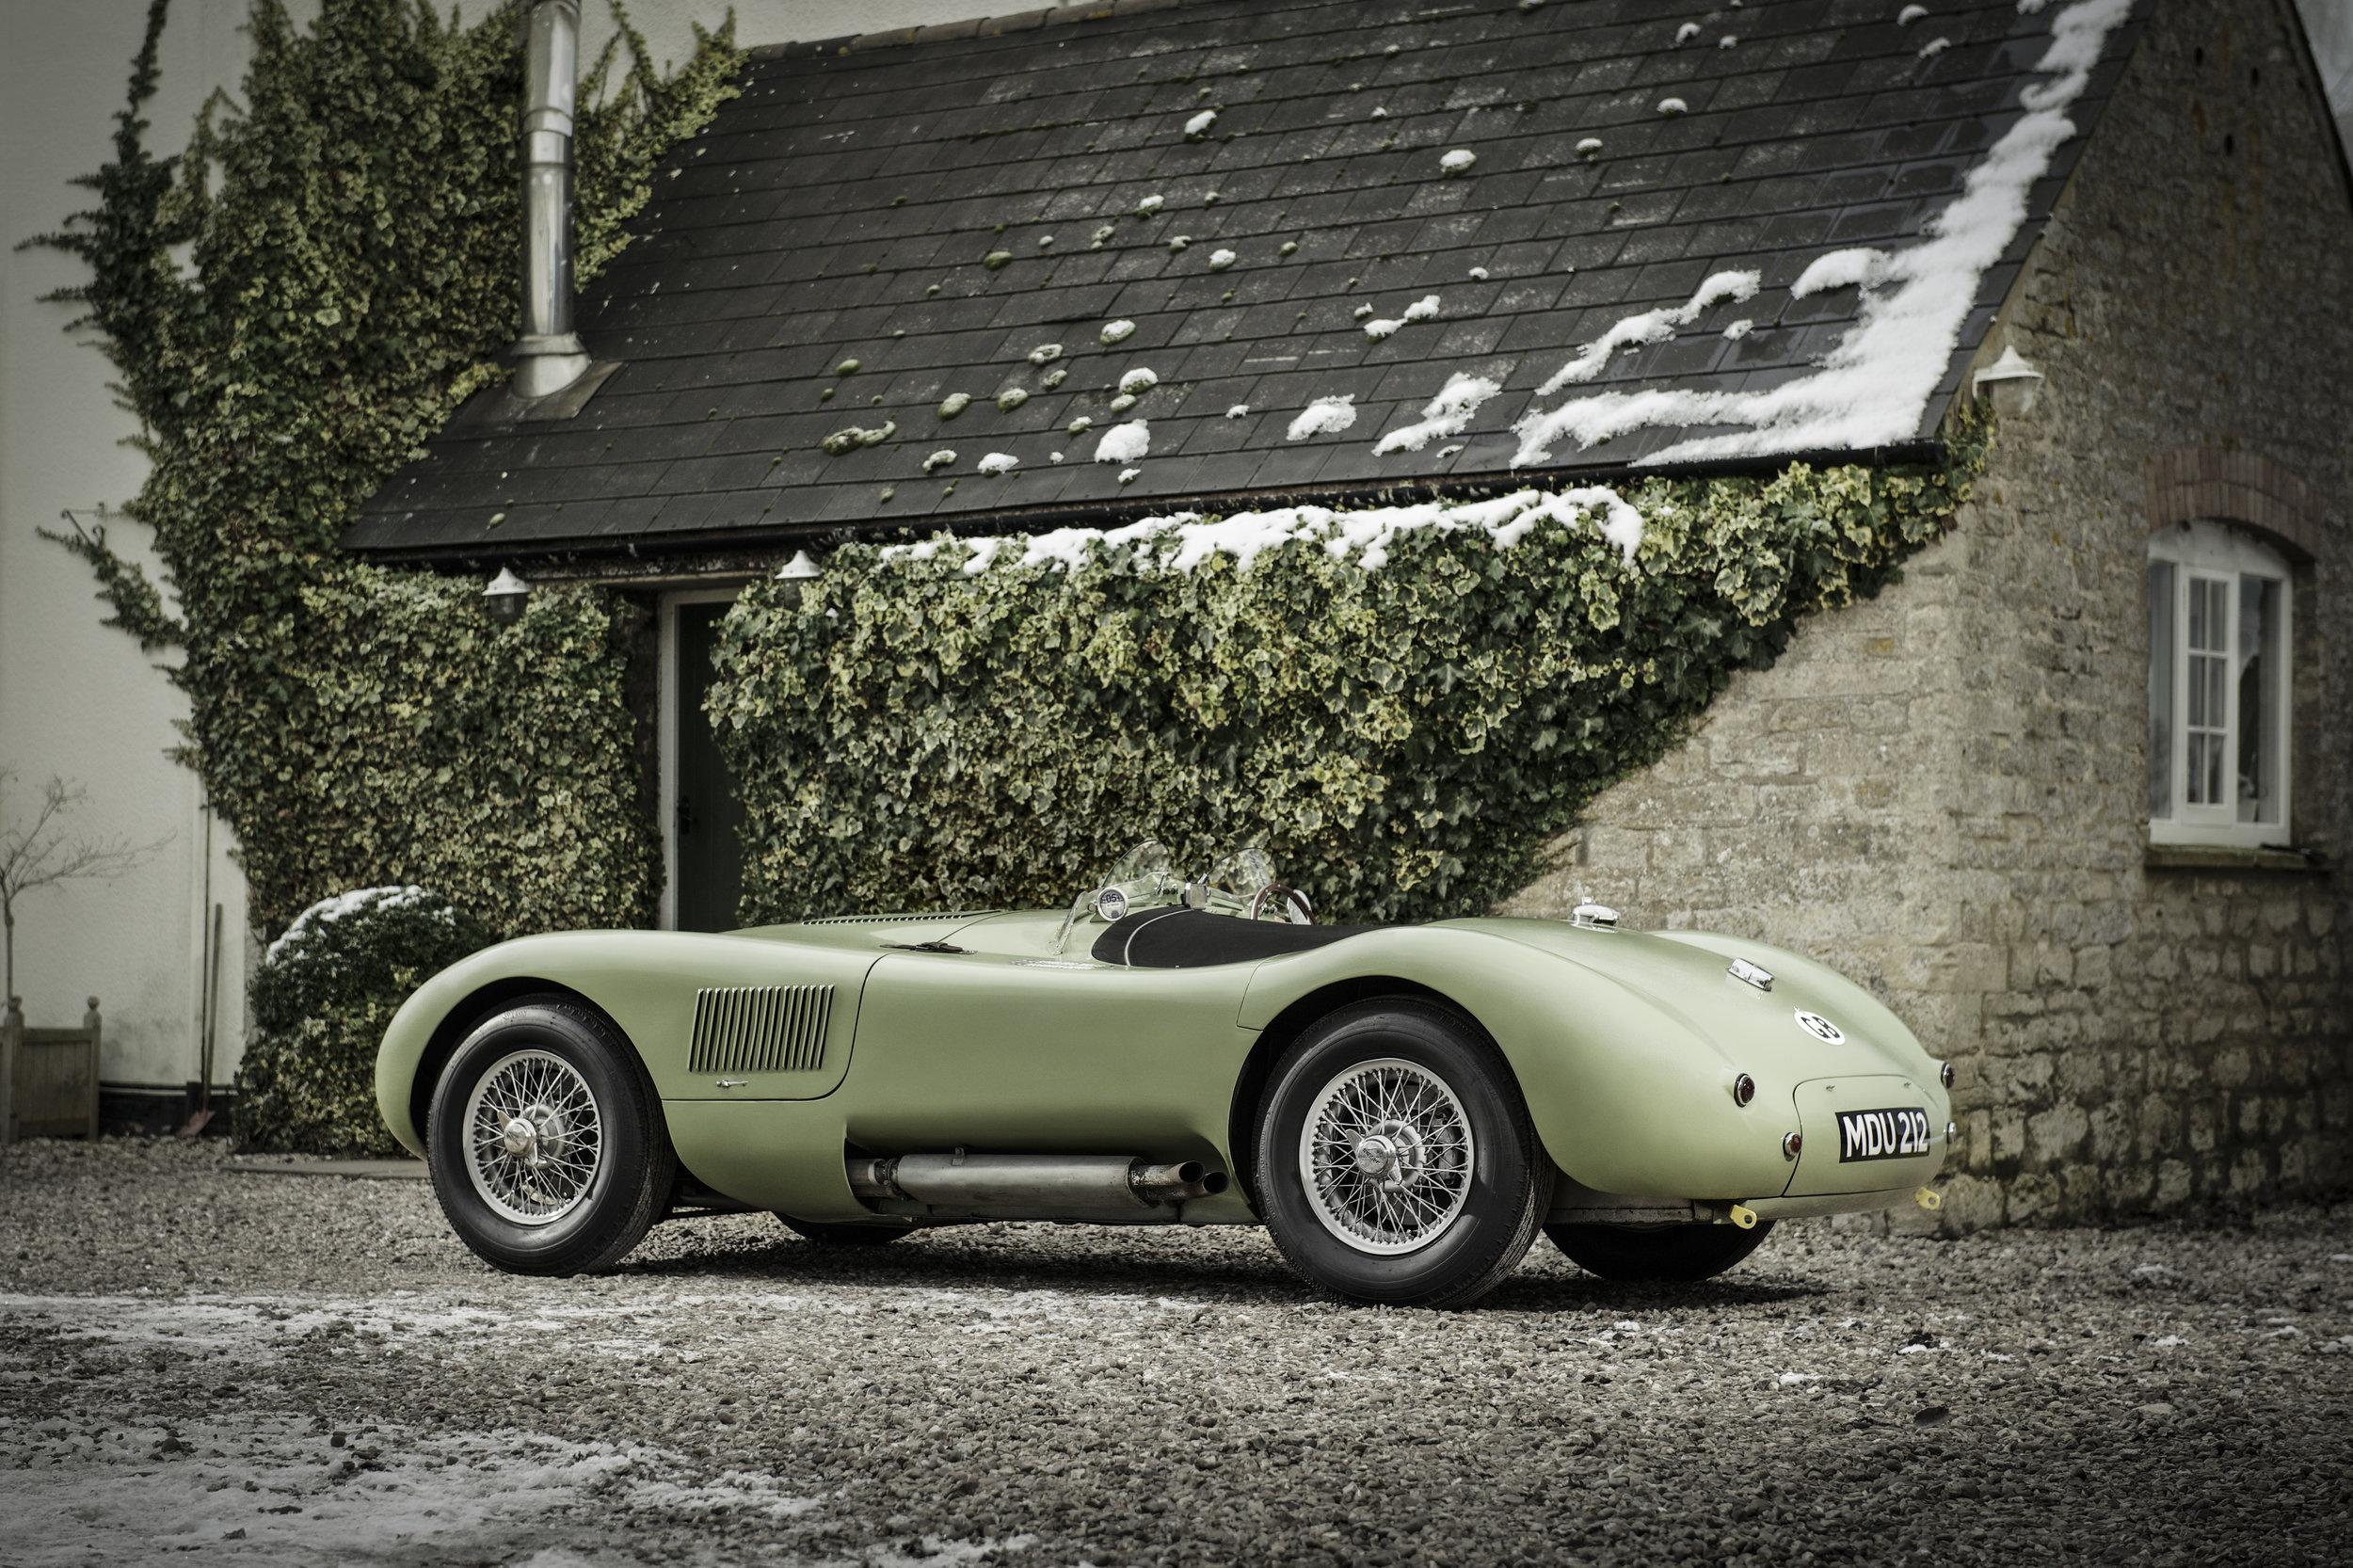 005 Jaguar_C-Type-006.jpg